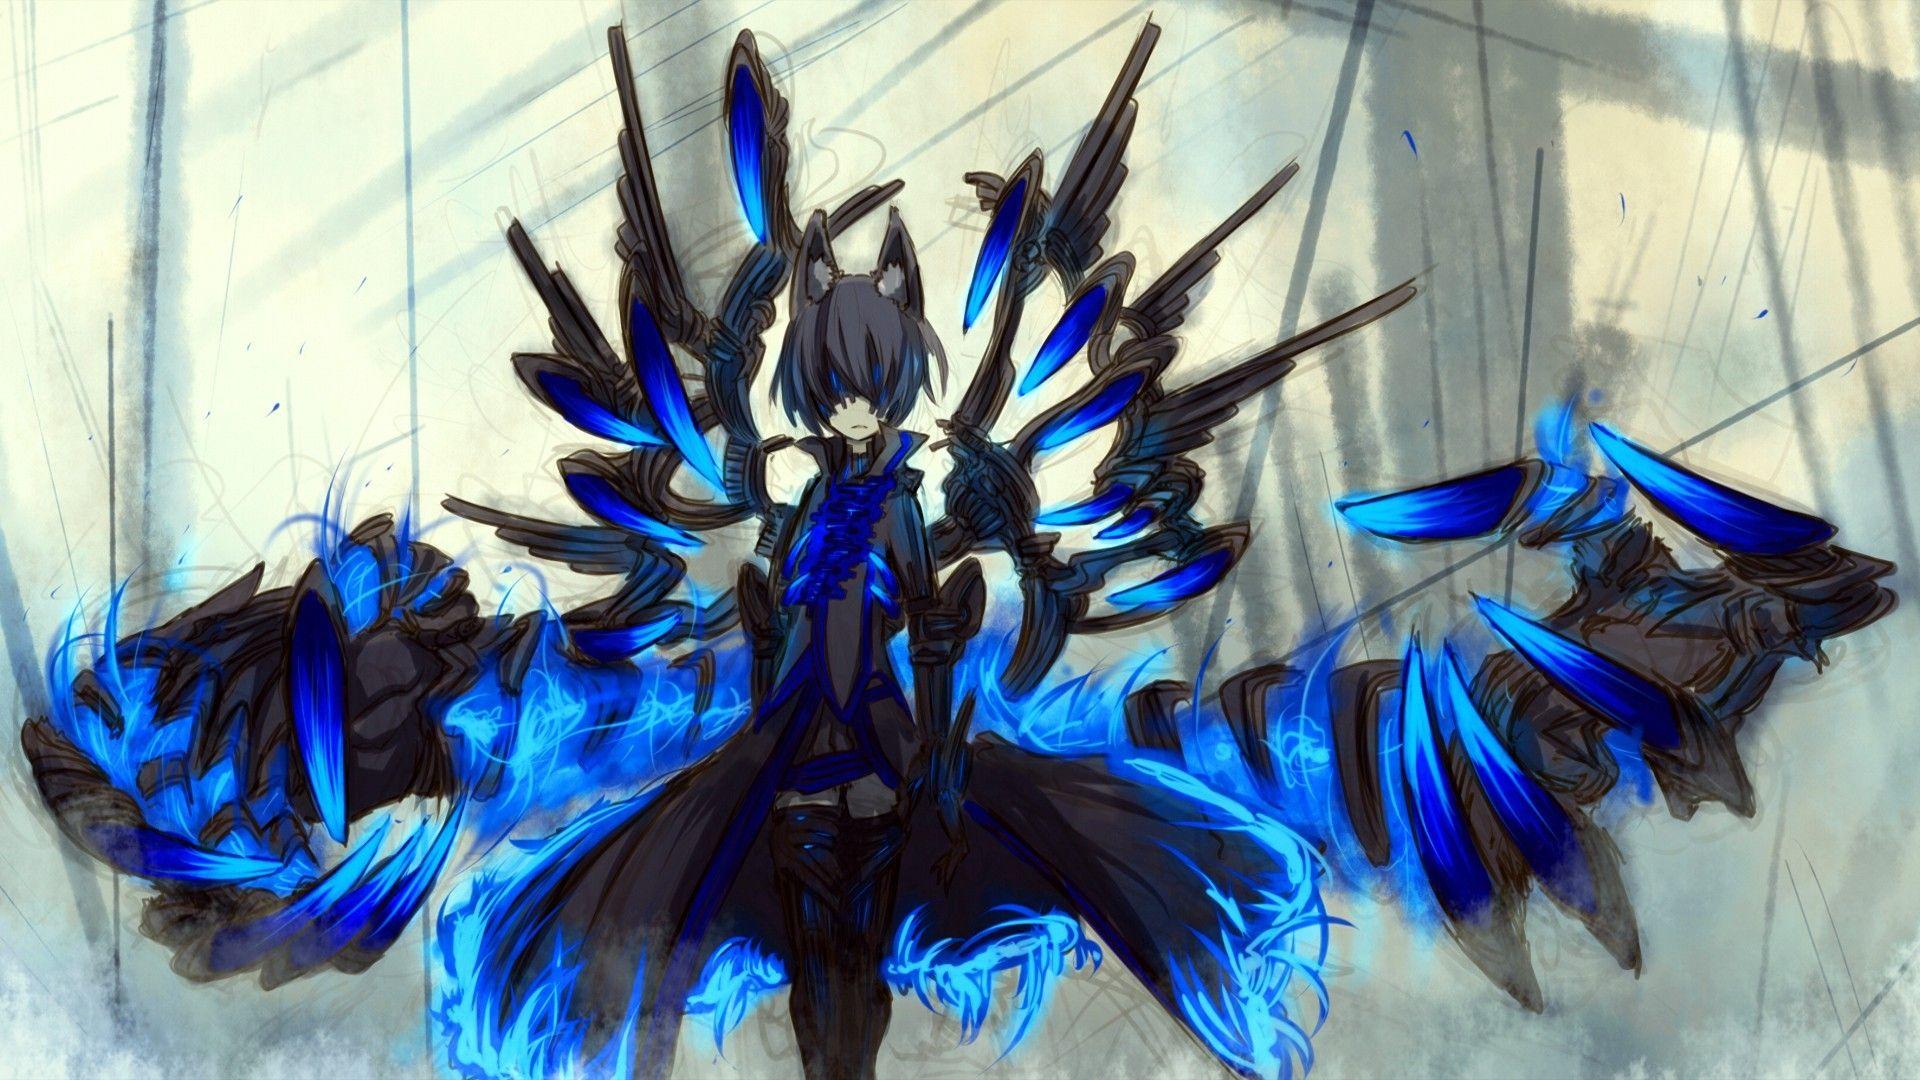 Pixiv Fantasia, Nekomimi, Blue, Original Characters, Blue